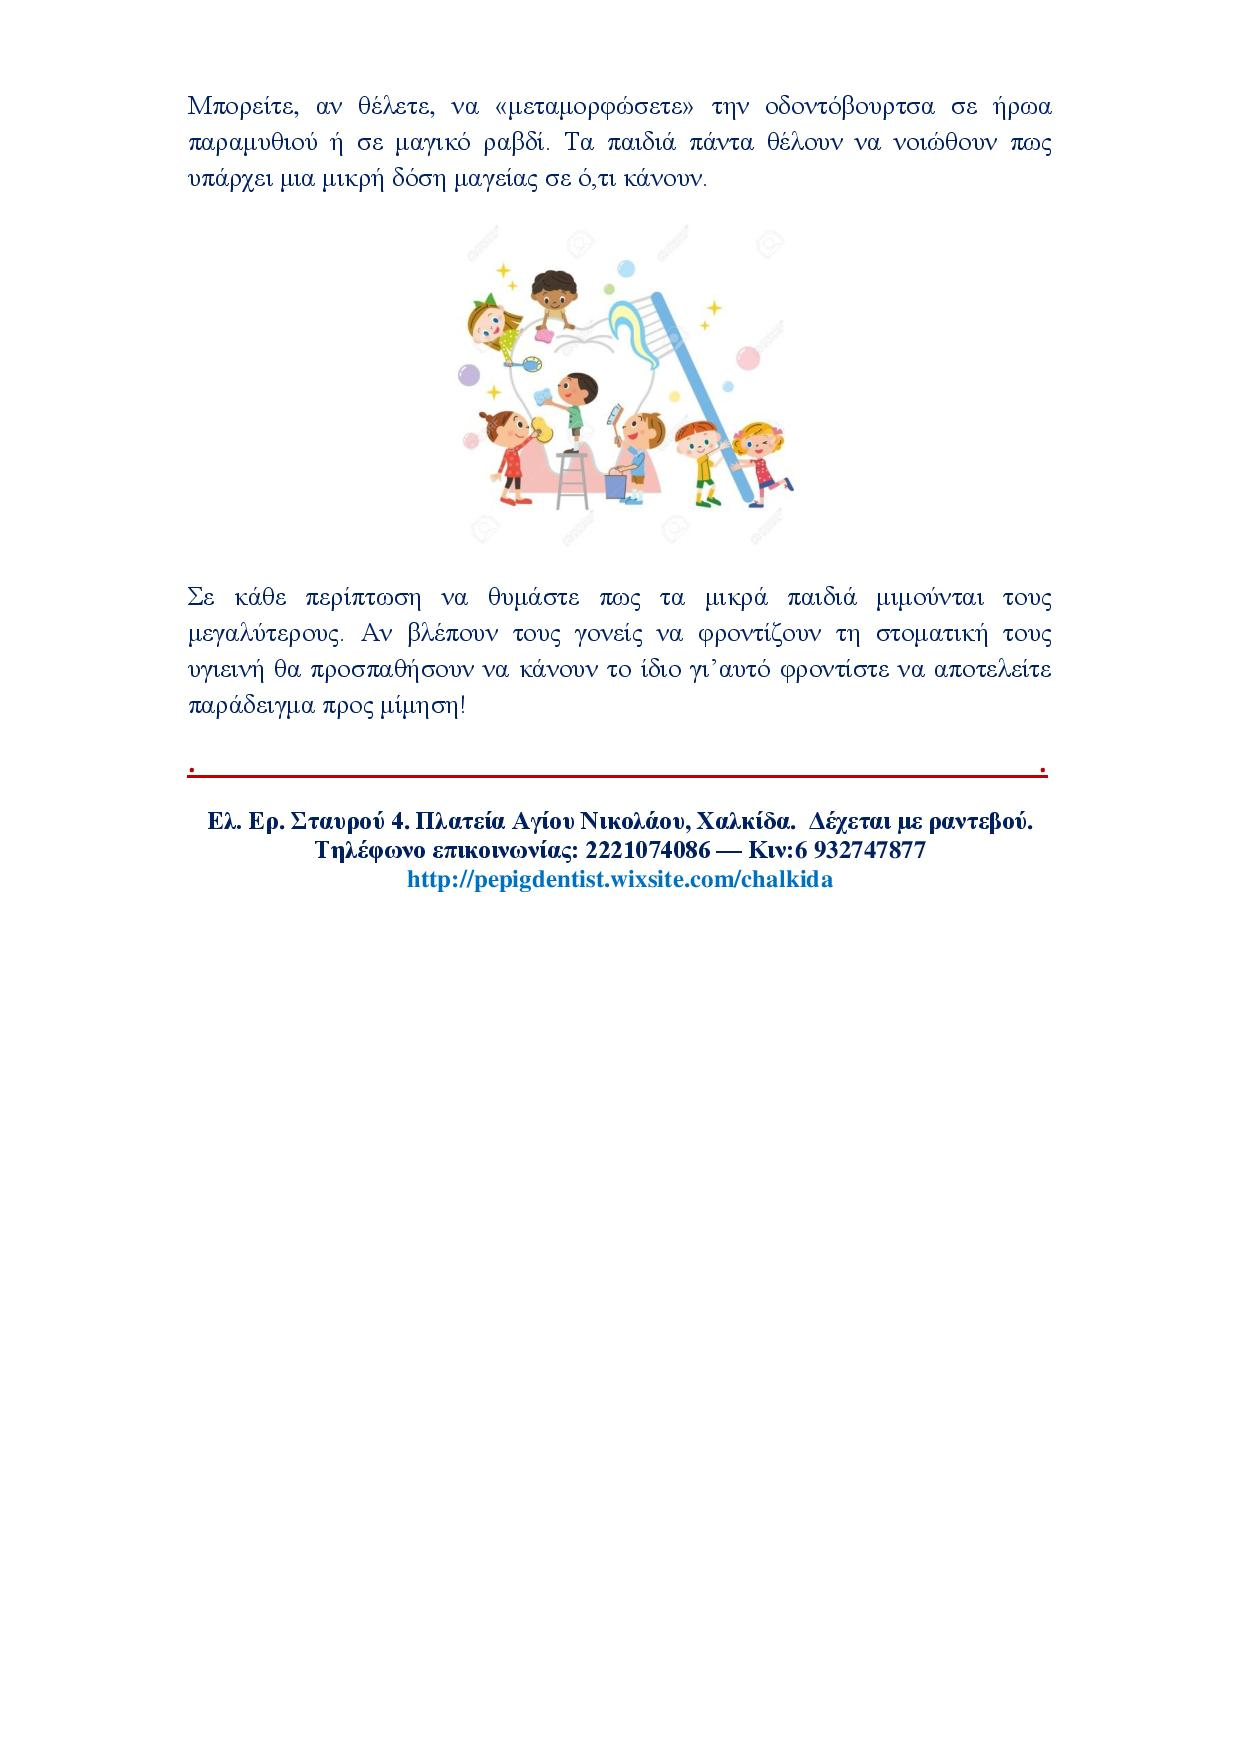 H Oδοντίατρος σας απαντά: «Πως μπορώ να κάνω το παιδί μου να βουρτσίζει τα δόντια του;» Document page 004